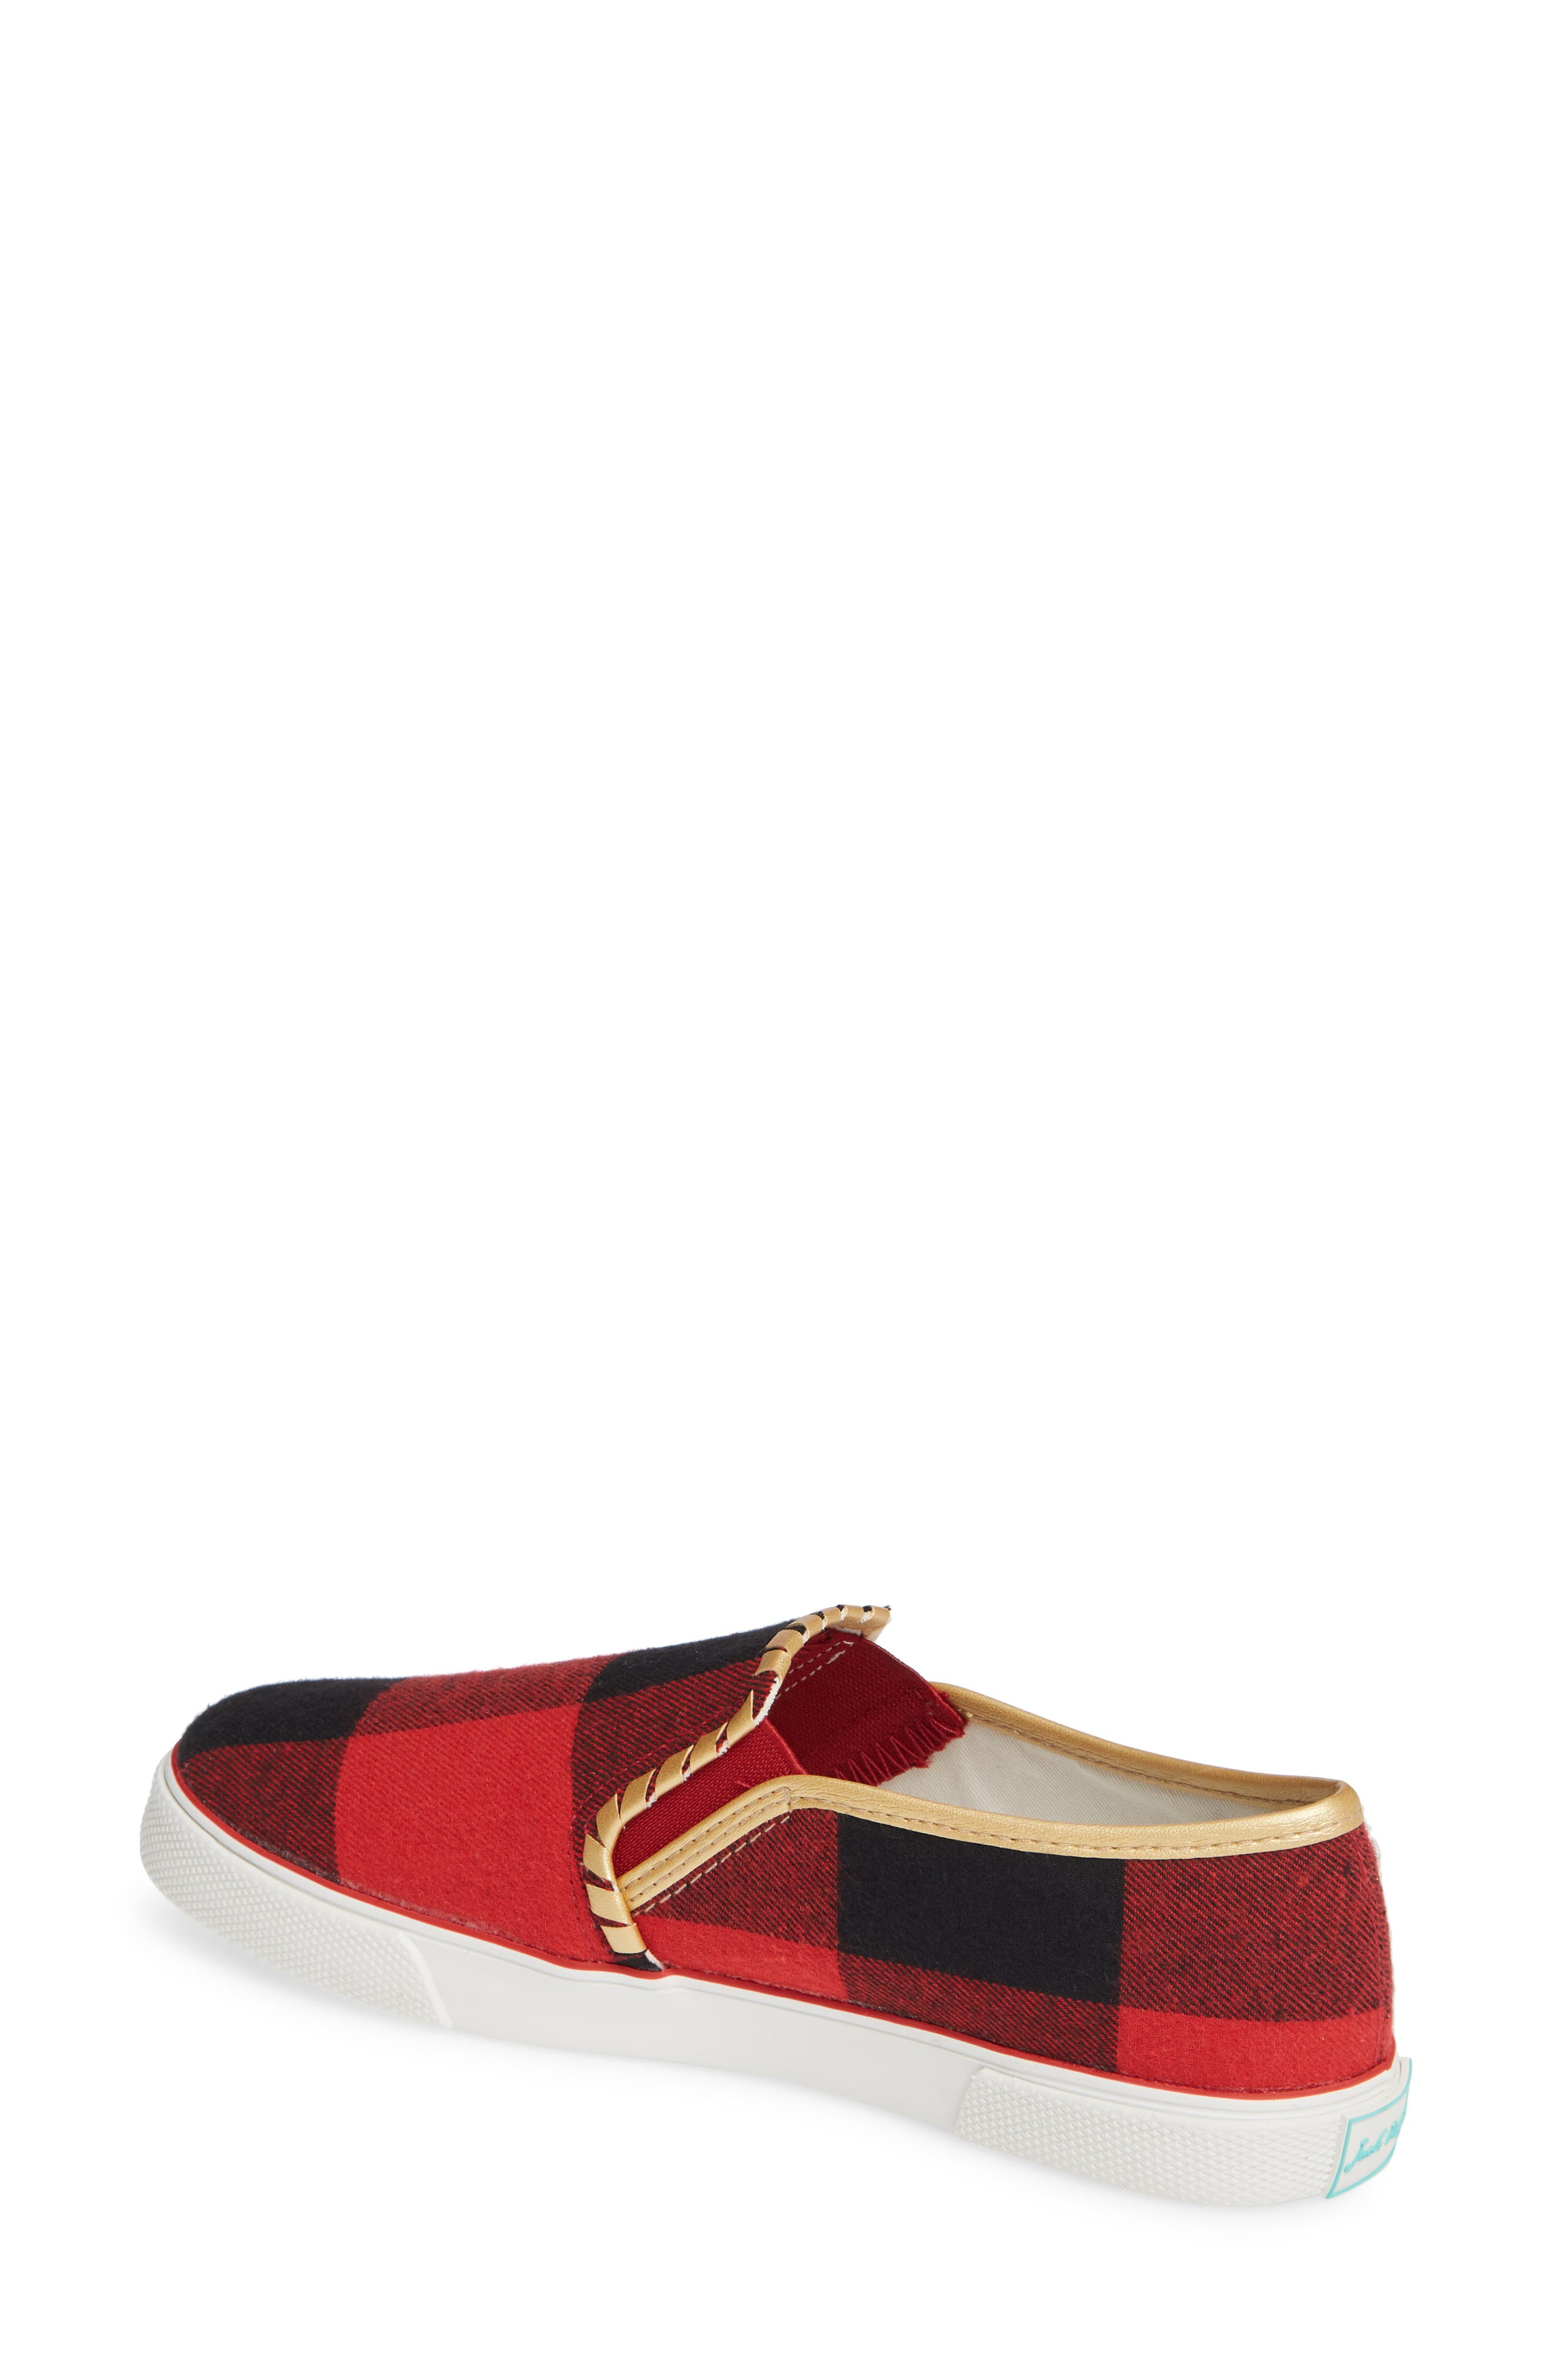 Brynne Slip-On Sneaker,                             Alternate thumbnail 2, color,                             RED/ BLACK FABRIC